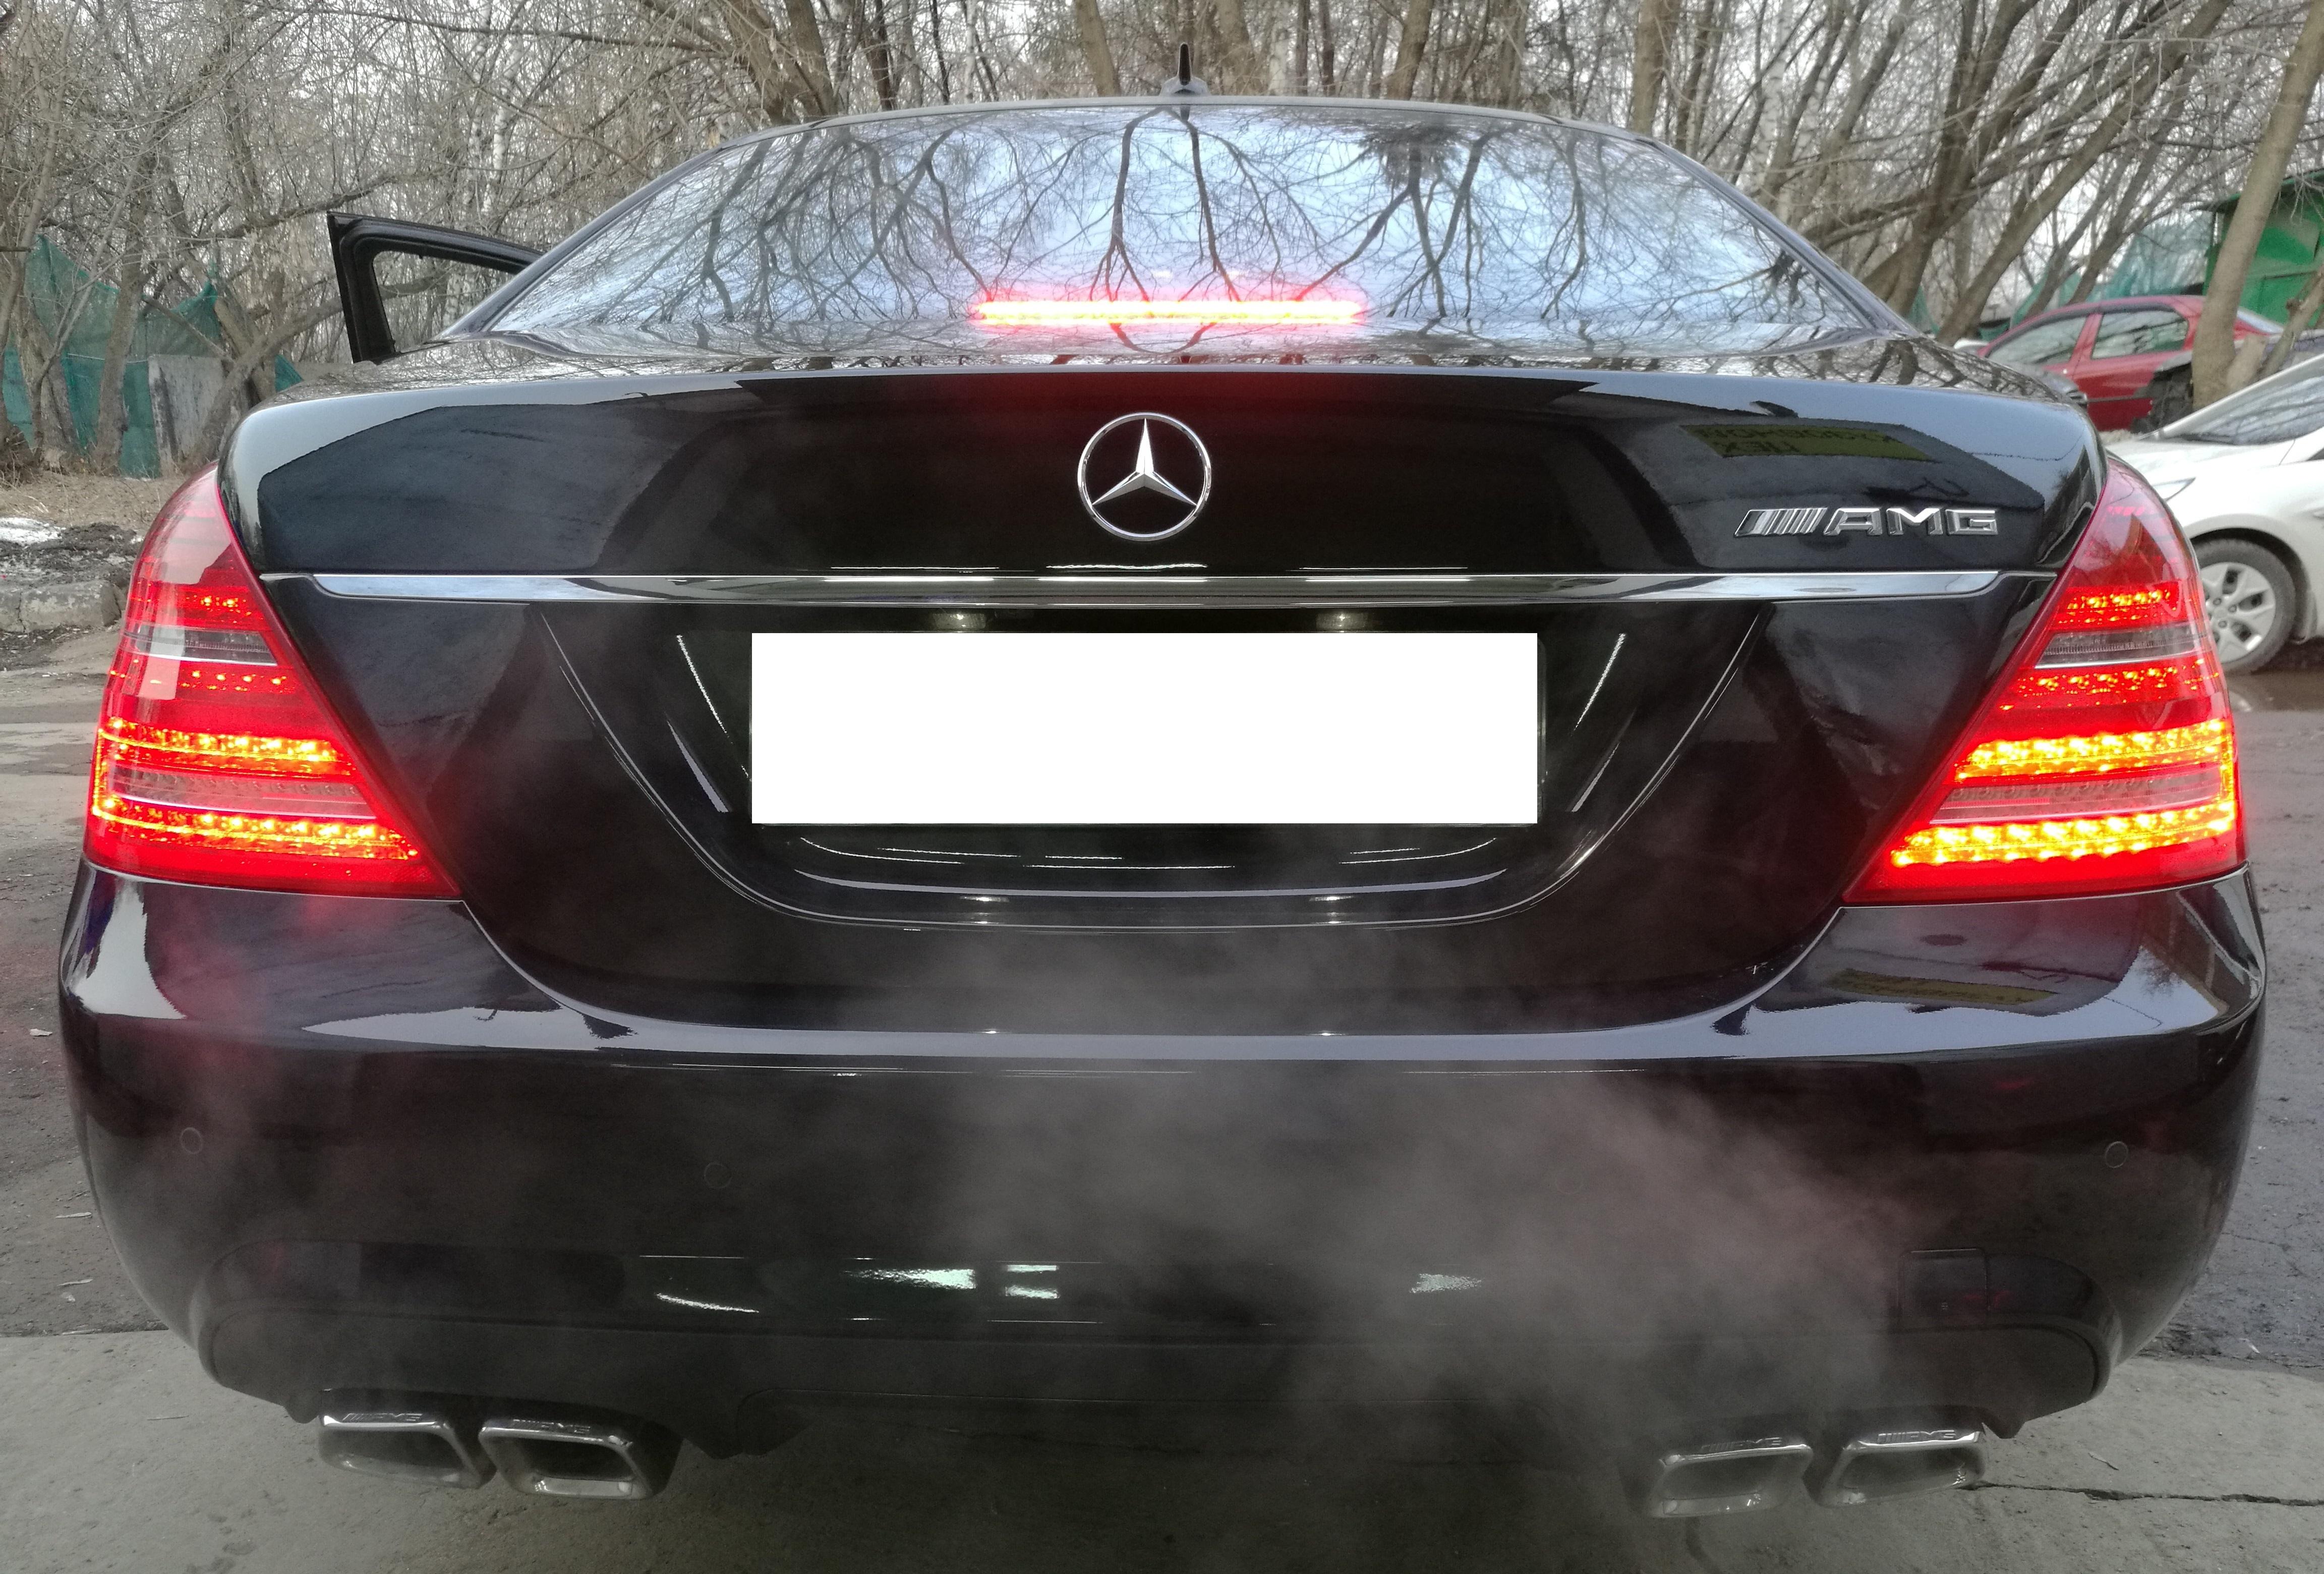 Рестайлинг тюнинг  обвес  Mercedes S-Class W 221 6.3 AMG